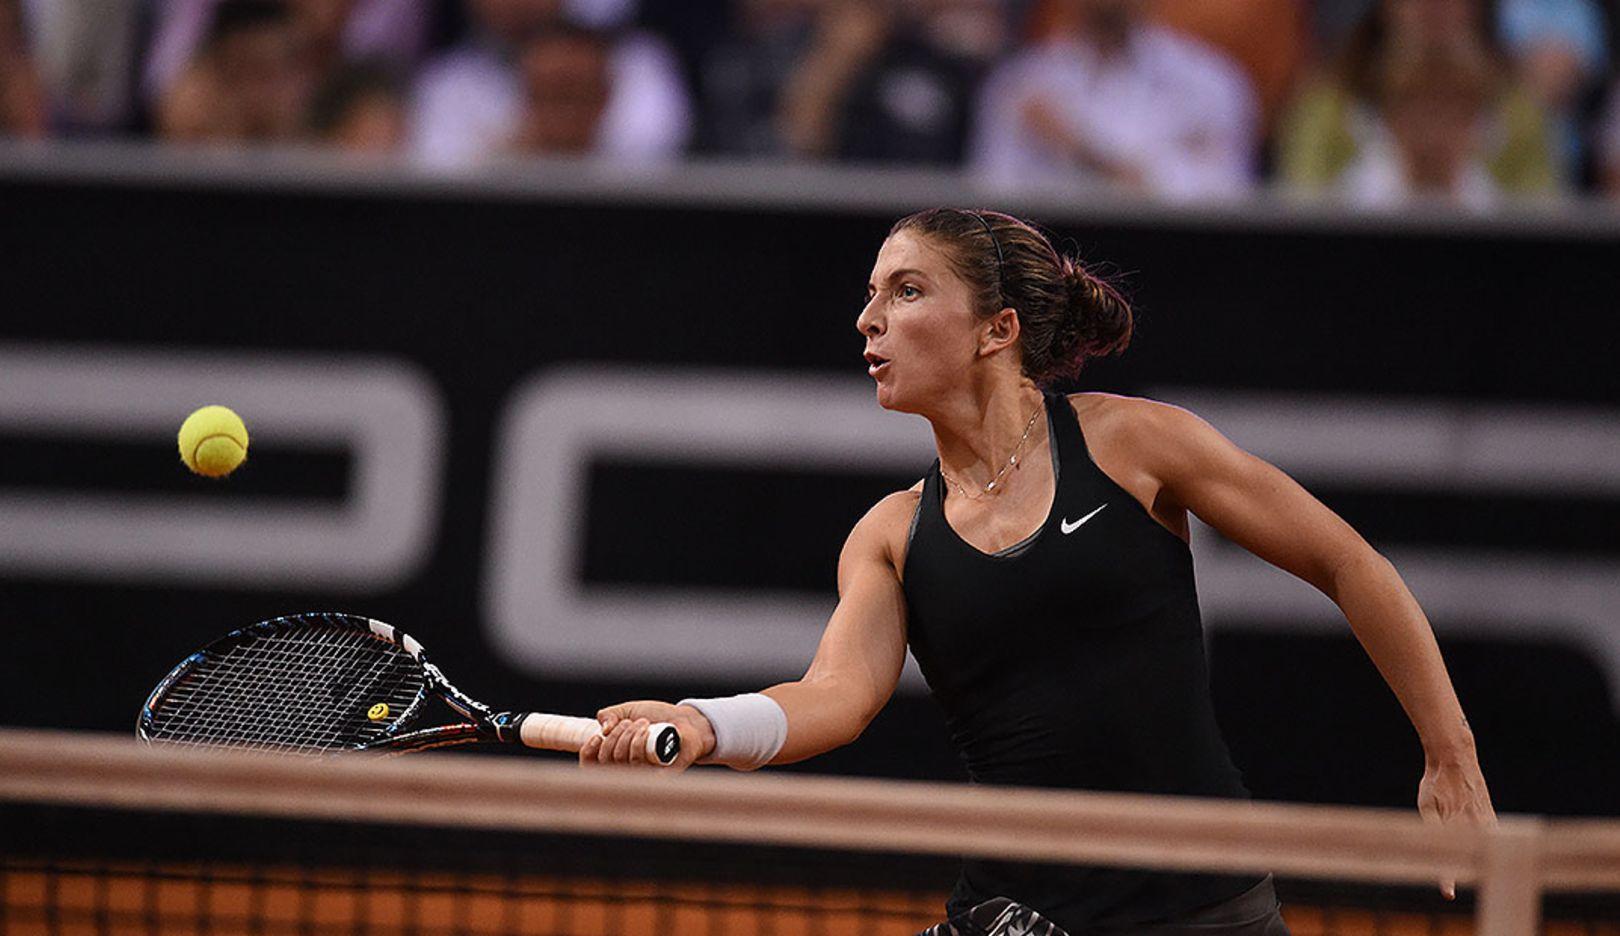 Sara Errani, Porsche Tennis Grand Prix, 2014, Porsche AG